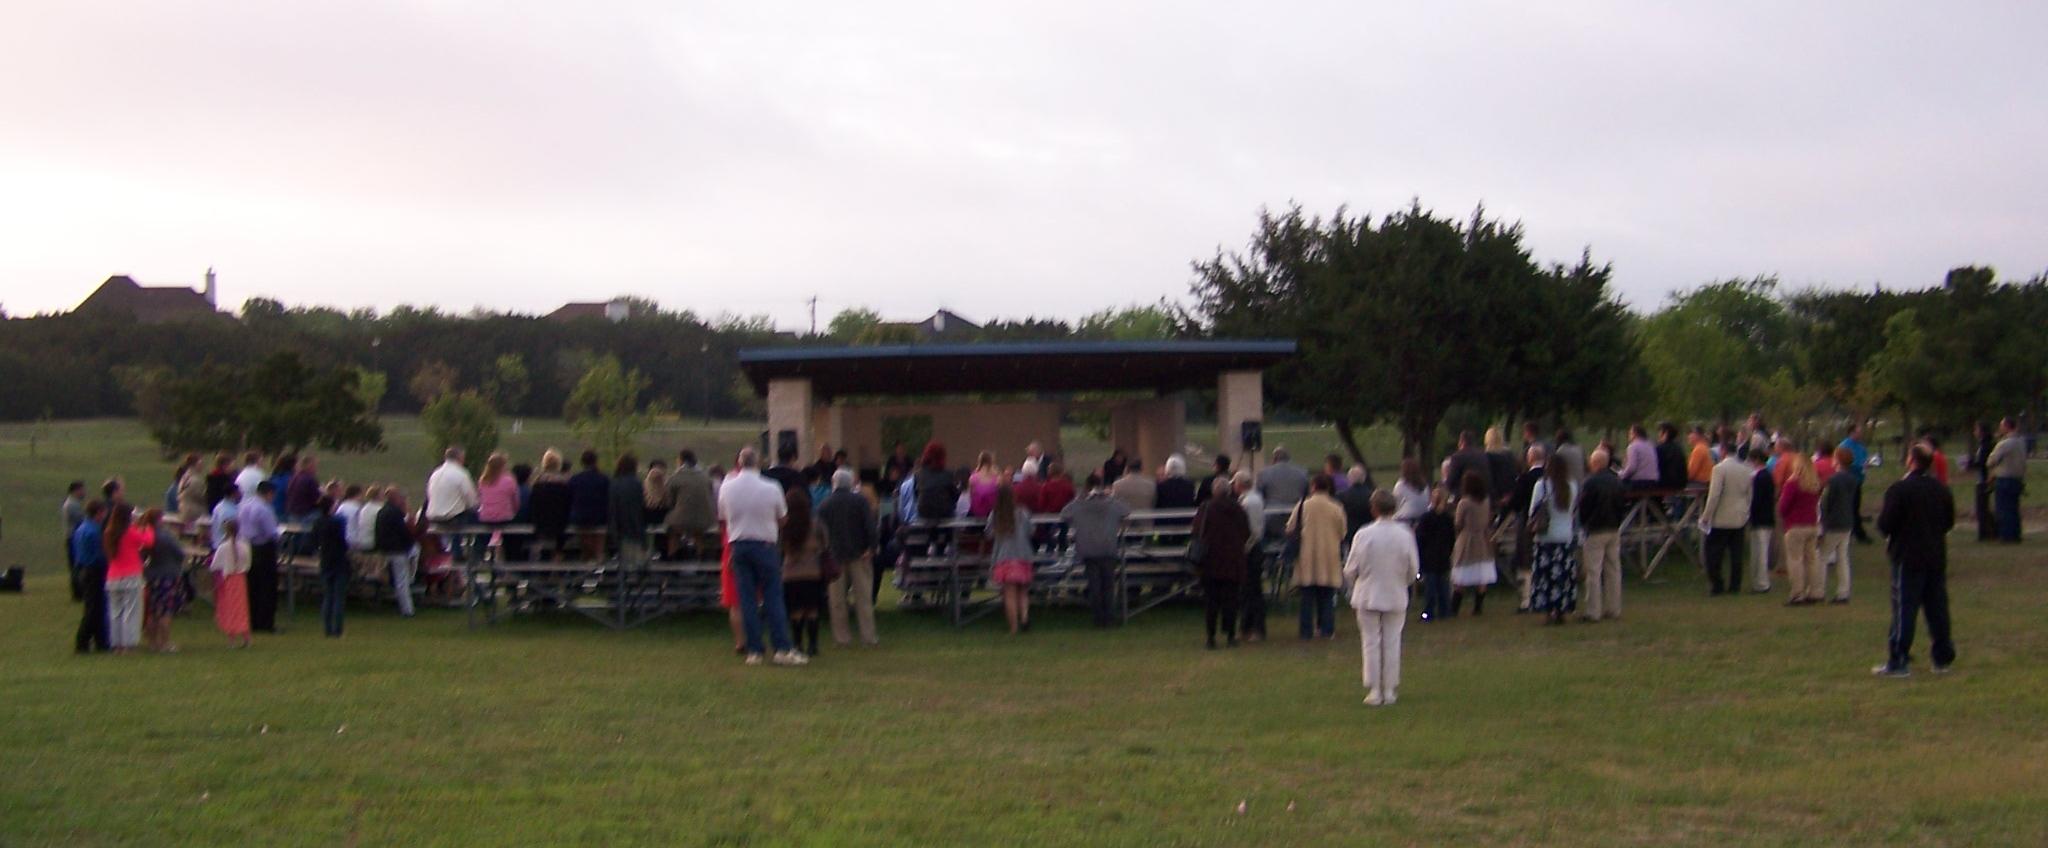 Easter Sunrise Service at Carl Levin Park 2014